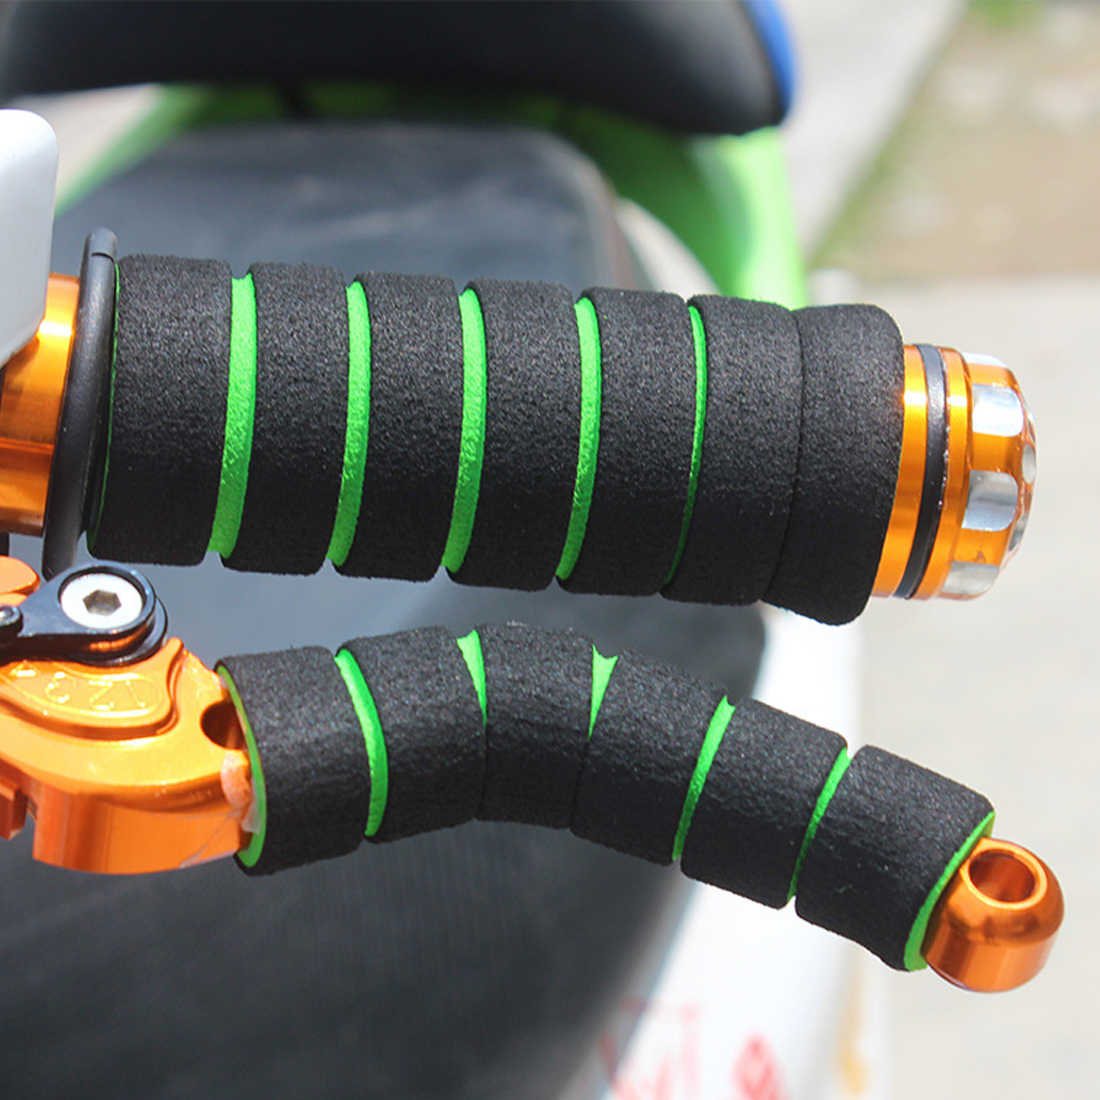 Xe máy Xử Lý Bar Foam Sponge Grip 4 Cái Đua Xe Đạp Xe Đạp Bìa Non-slip Mềm Tay Lái Xe Đạp bar tape accesorios bicicleta